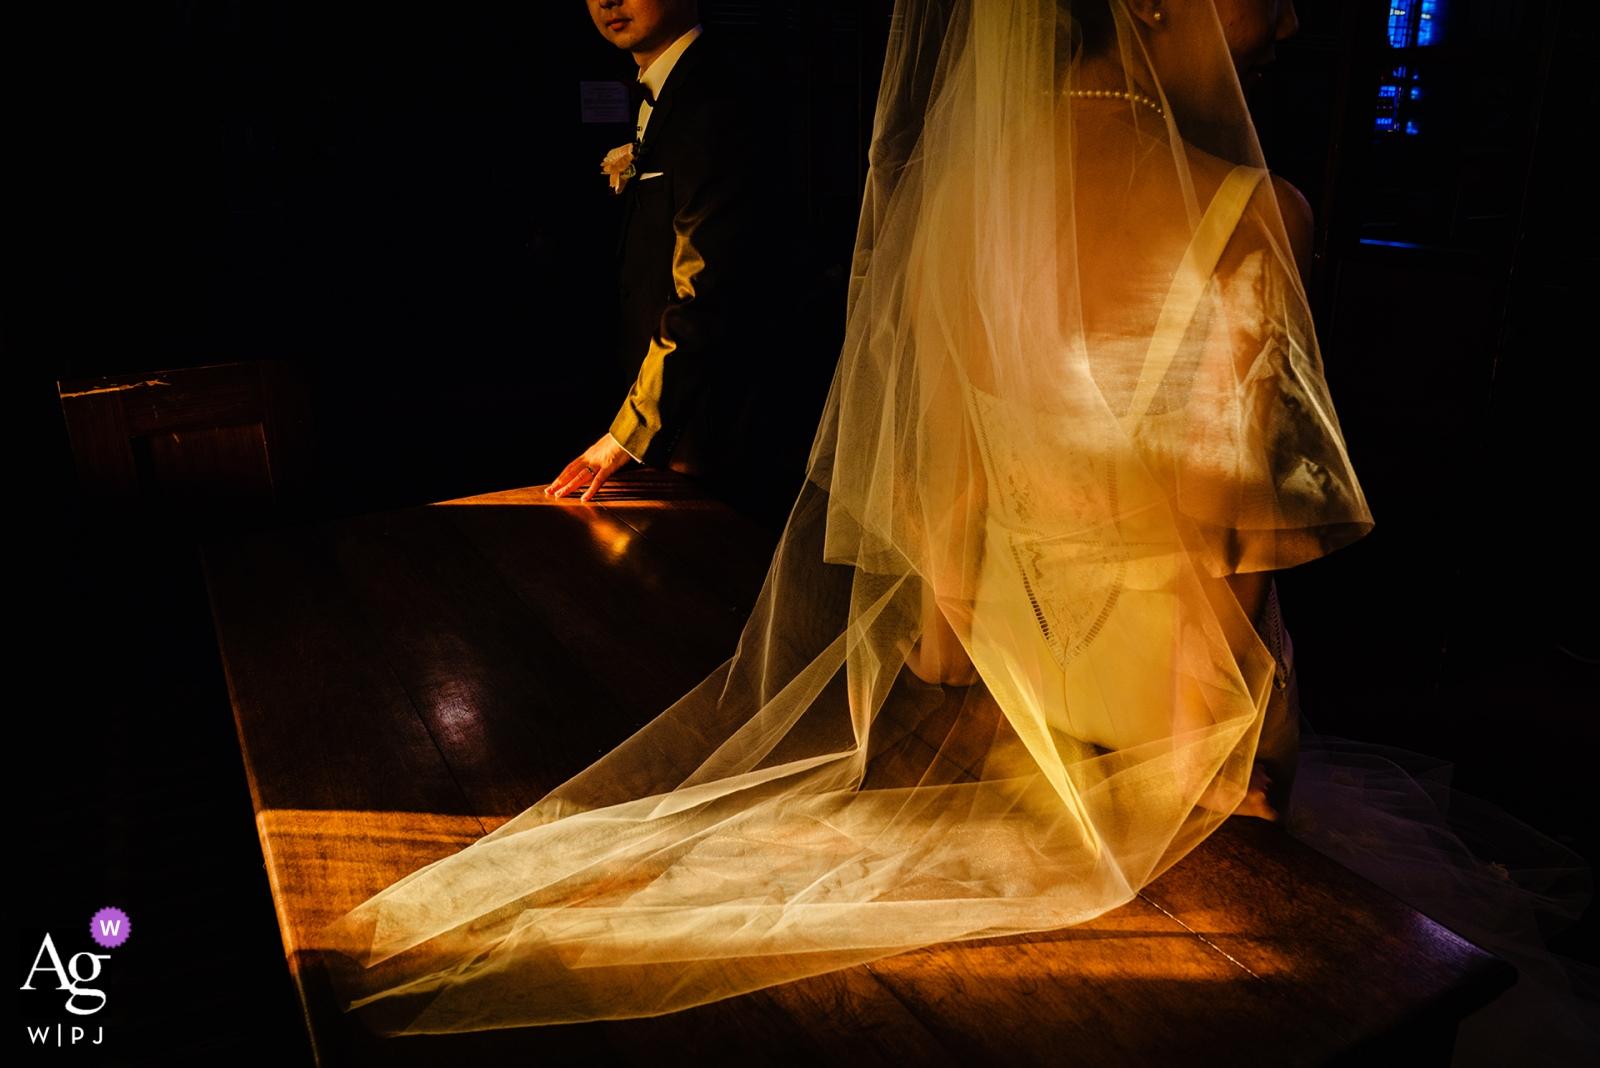 Goddard Chapel, Medford wedding photographer | natural lighting through church window is illuminating the bride and groom